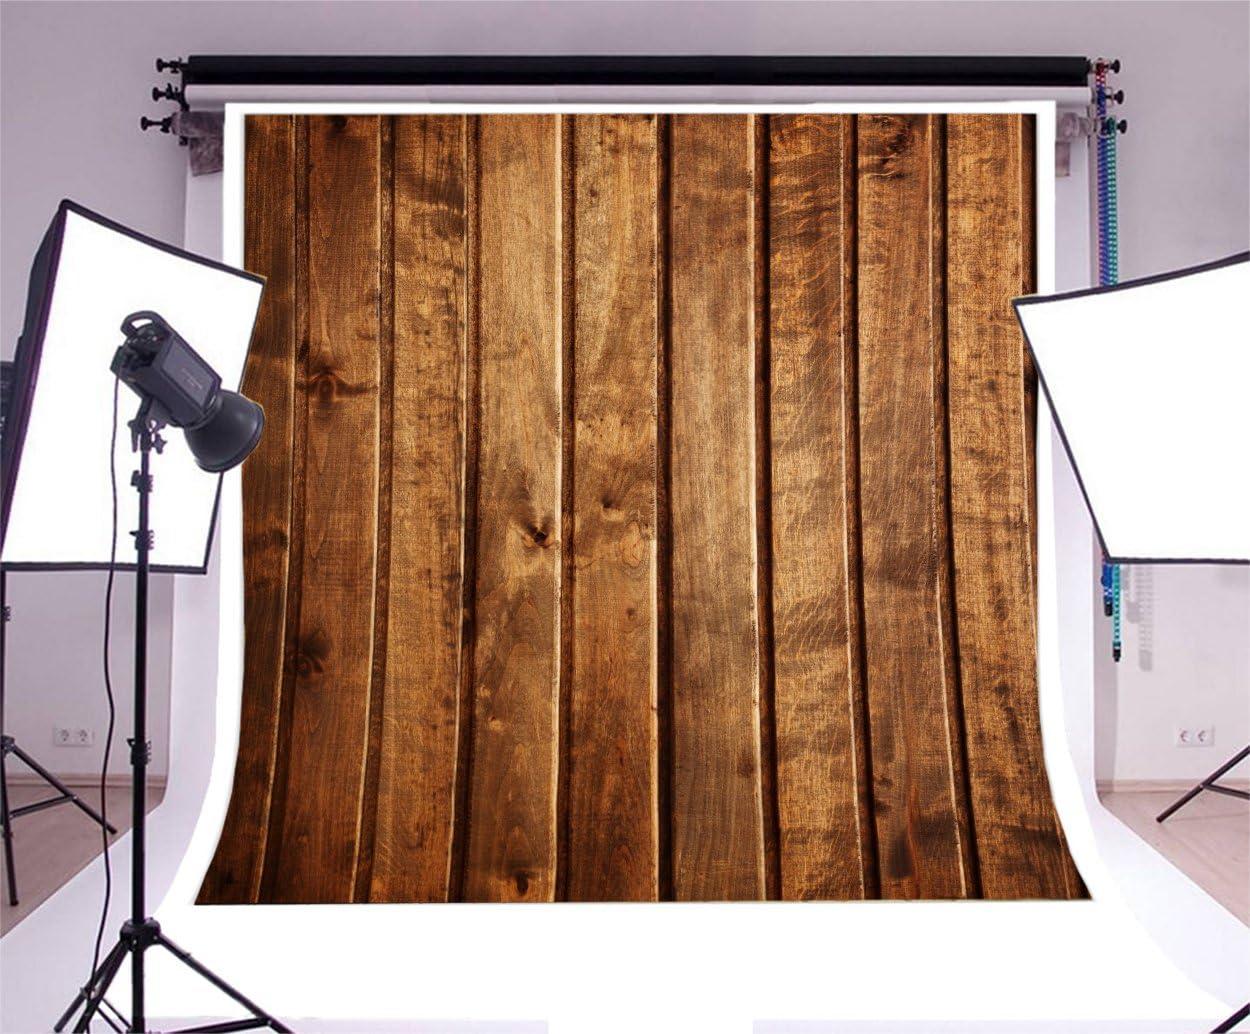 Leowefowa 10X10FT Shabby Wood Backdrop Nostalgia Stripes Wooden Floor Backdrops for Photography Rustic Plank Vinyl Photo Background Kids Adults Portraits Studio Props